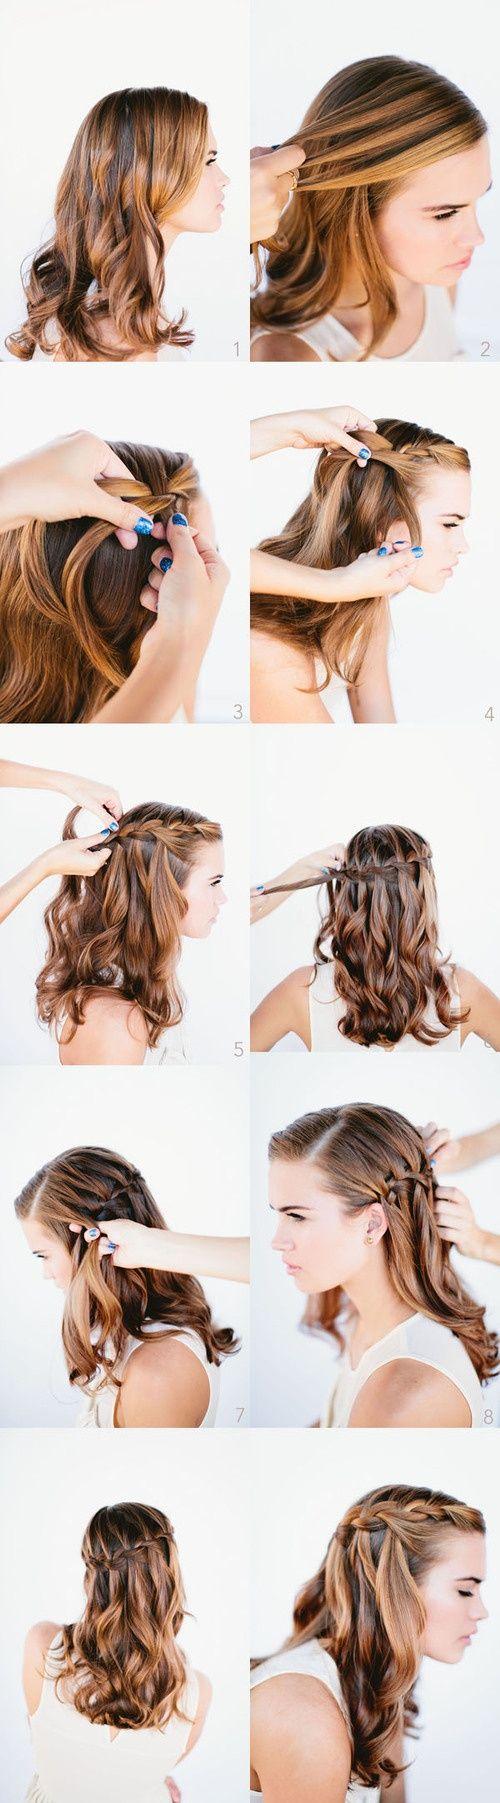 How to: WaterFall Braid